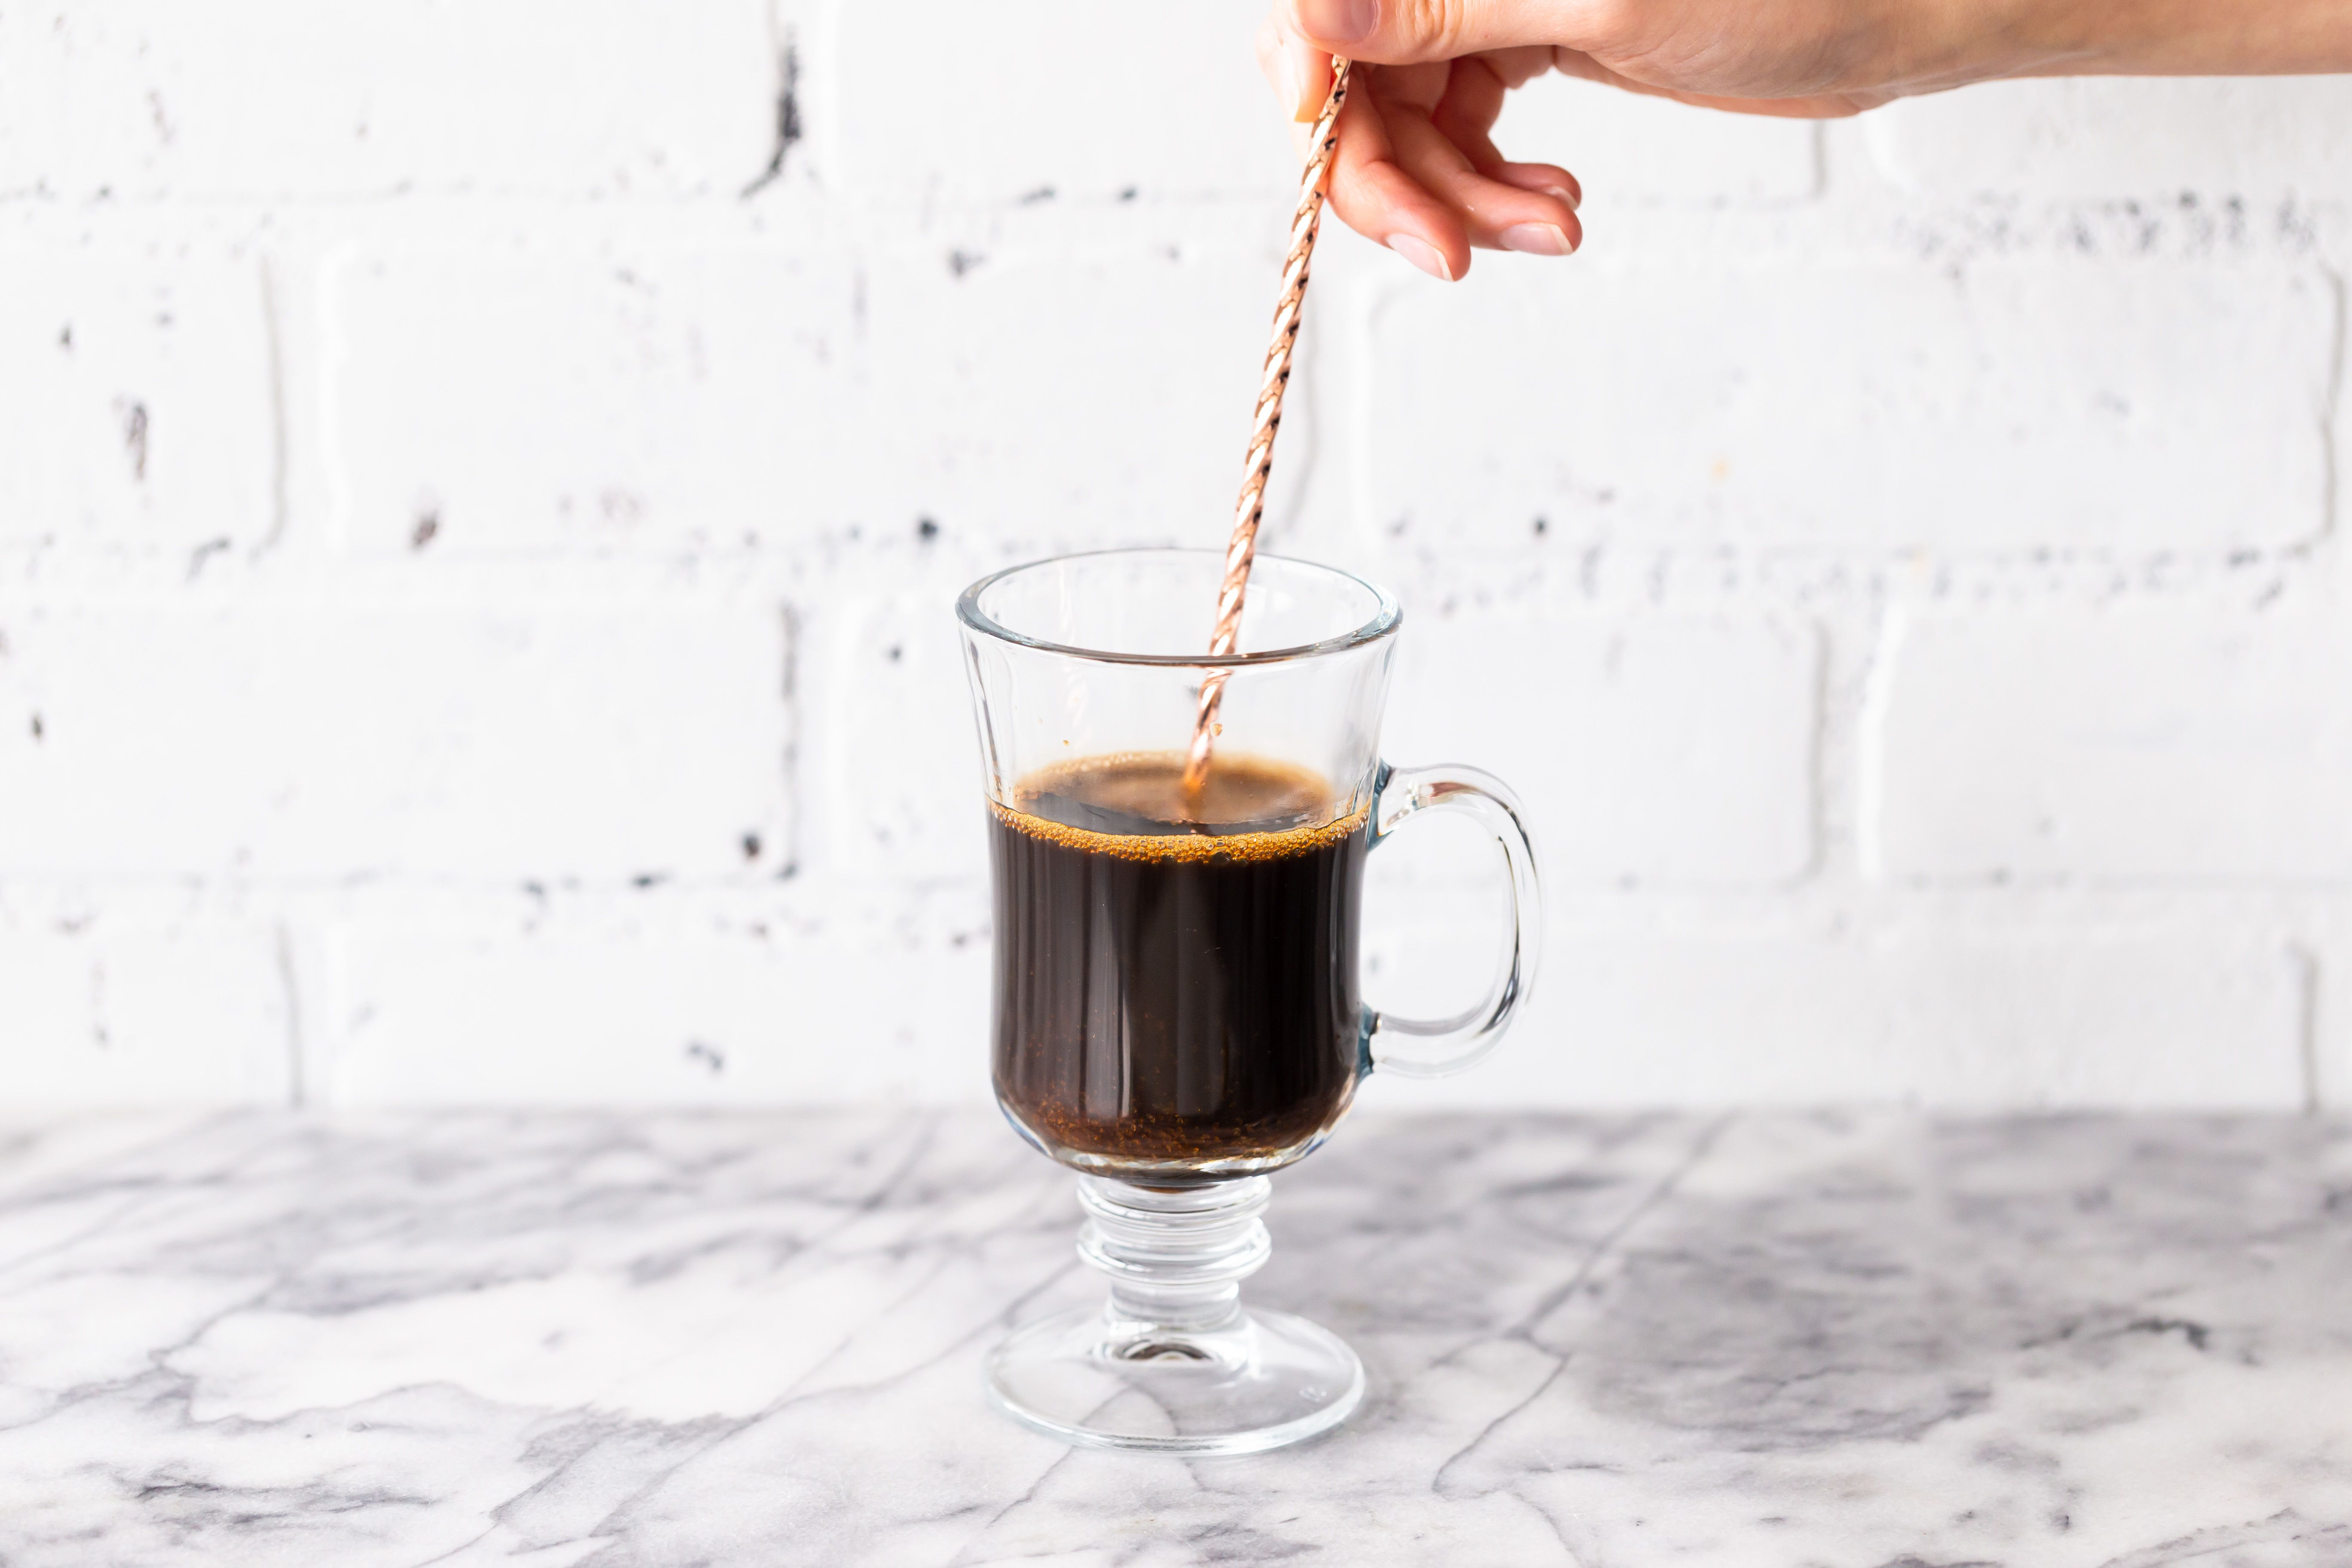 Stir until the brown sugar is dissolved